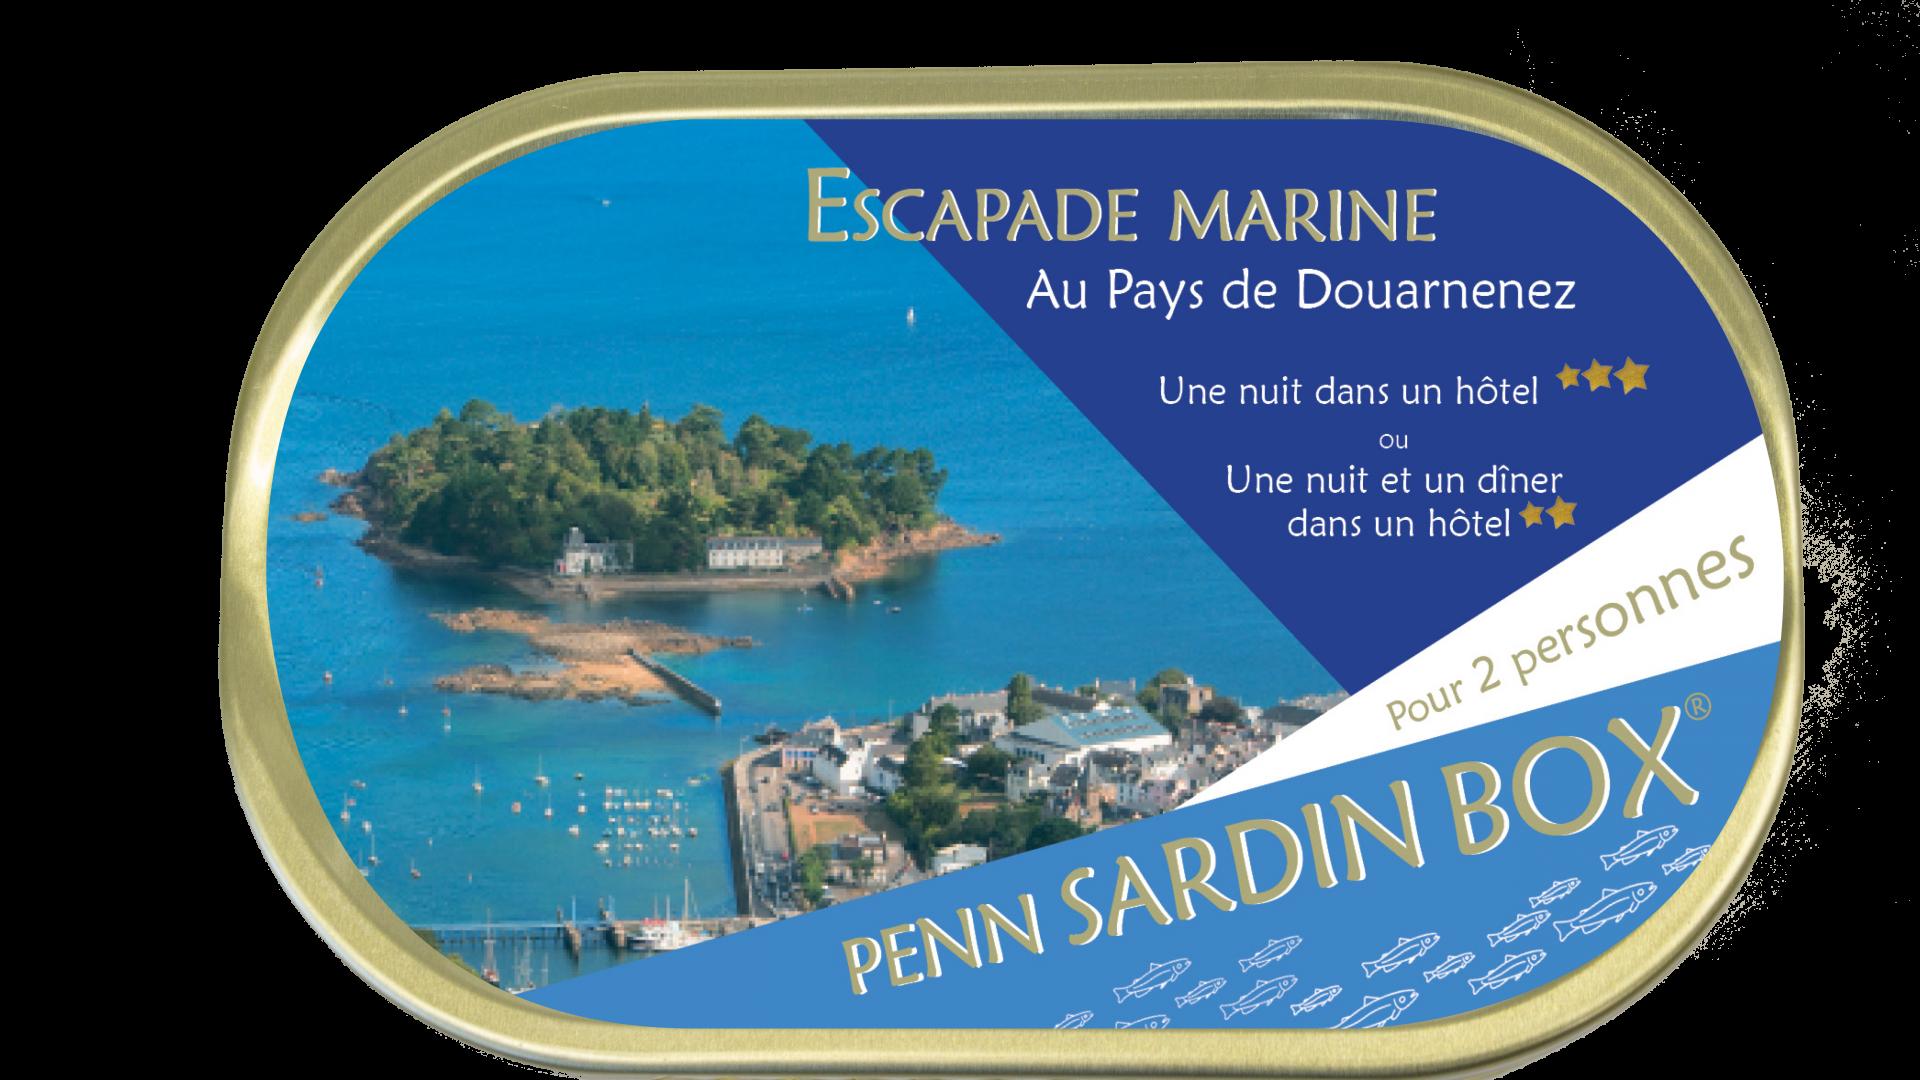 Penn Sardin Box Box Escapades Marines